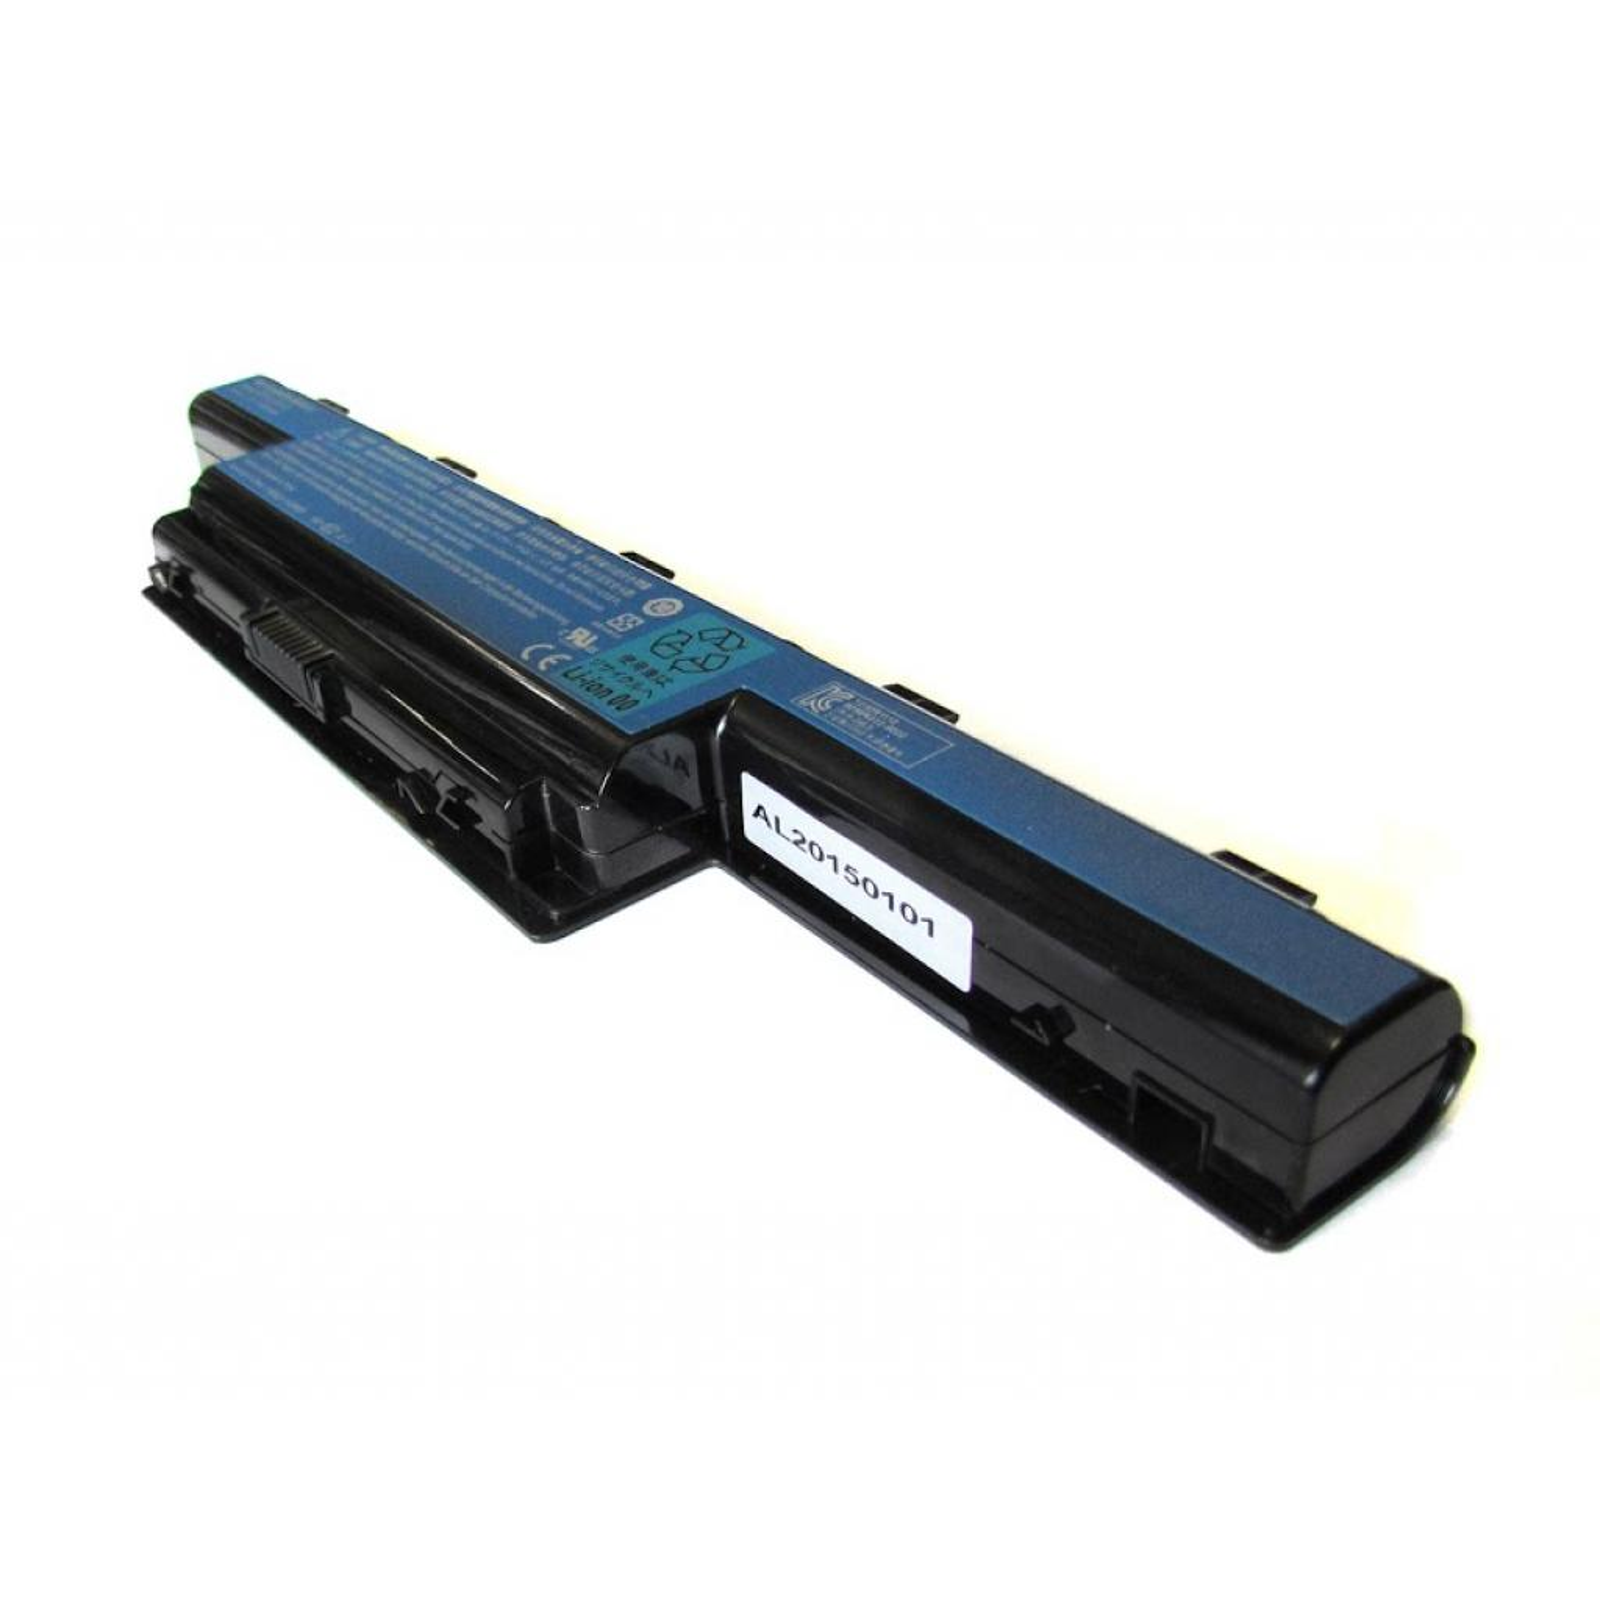 Аккумулятор для ноутбука Acer Aspire 4741 11,1V 4400mAh Grand-X (AS10D31)